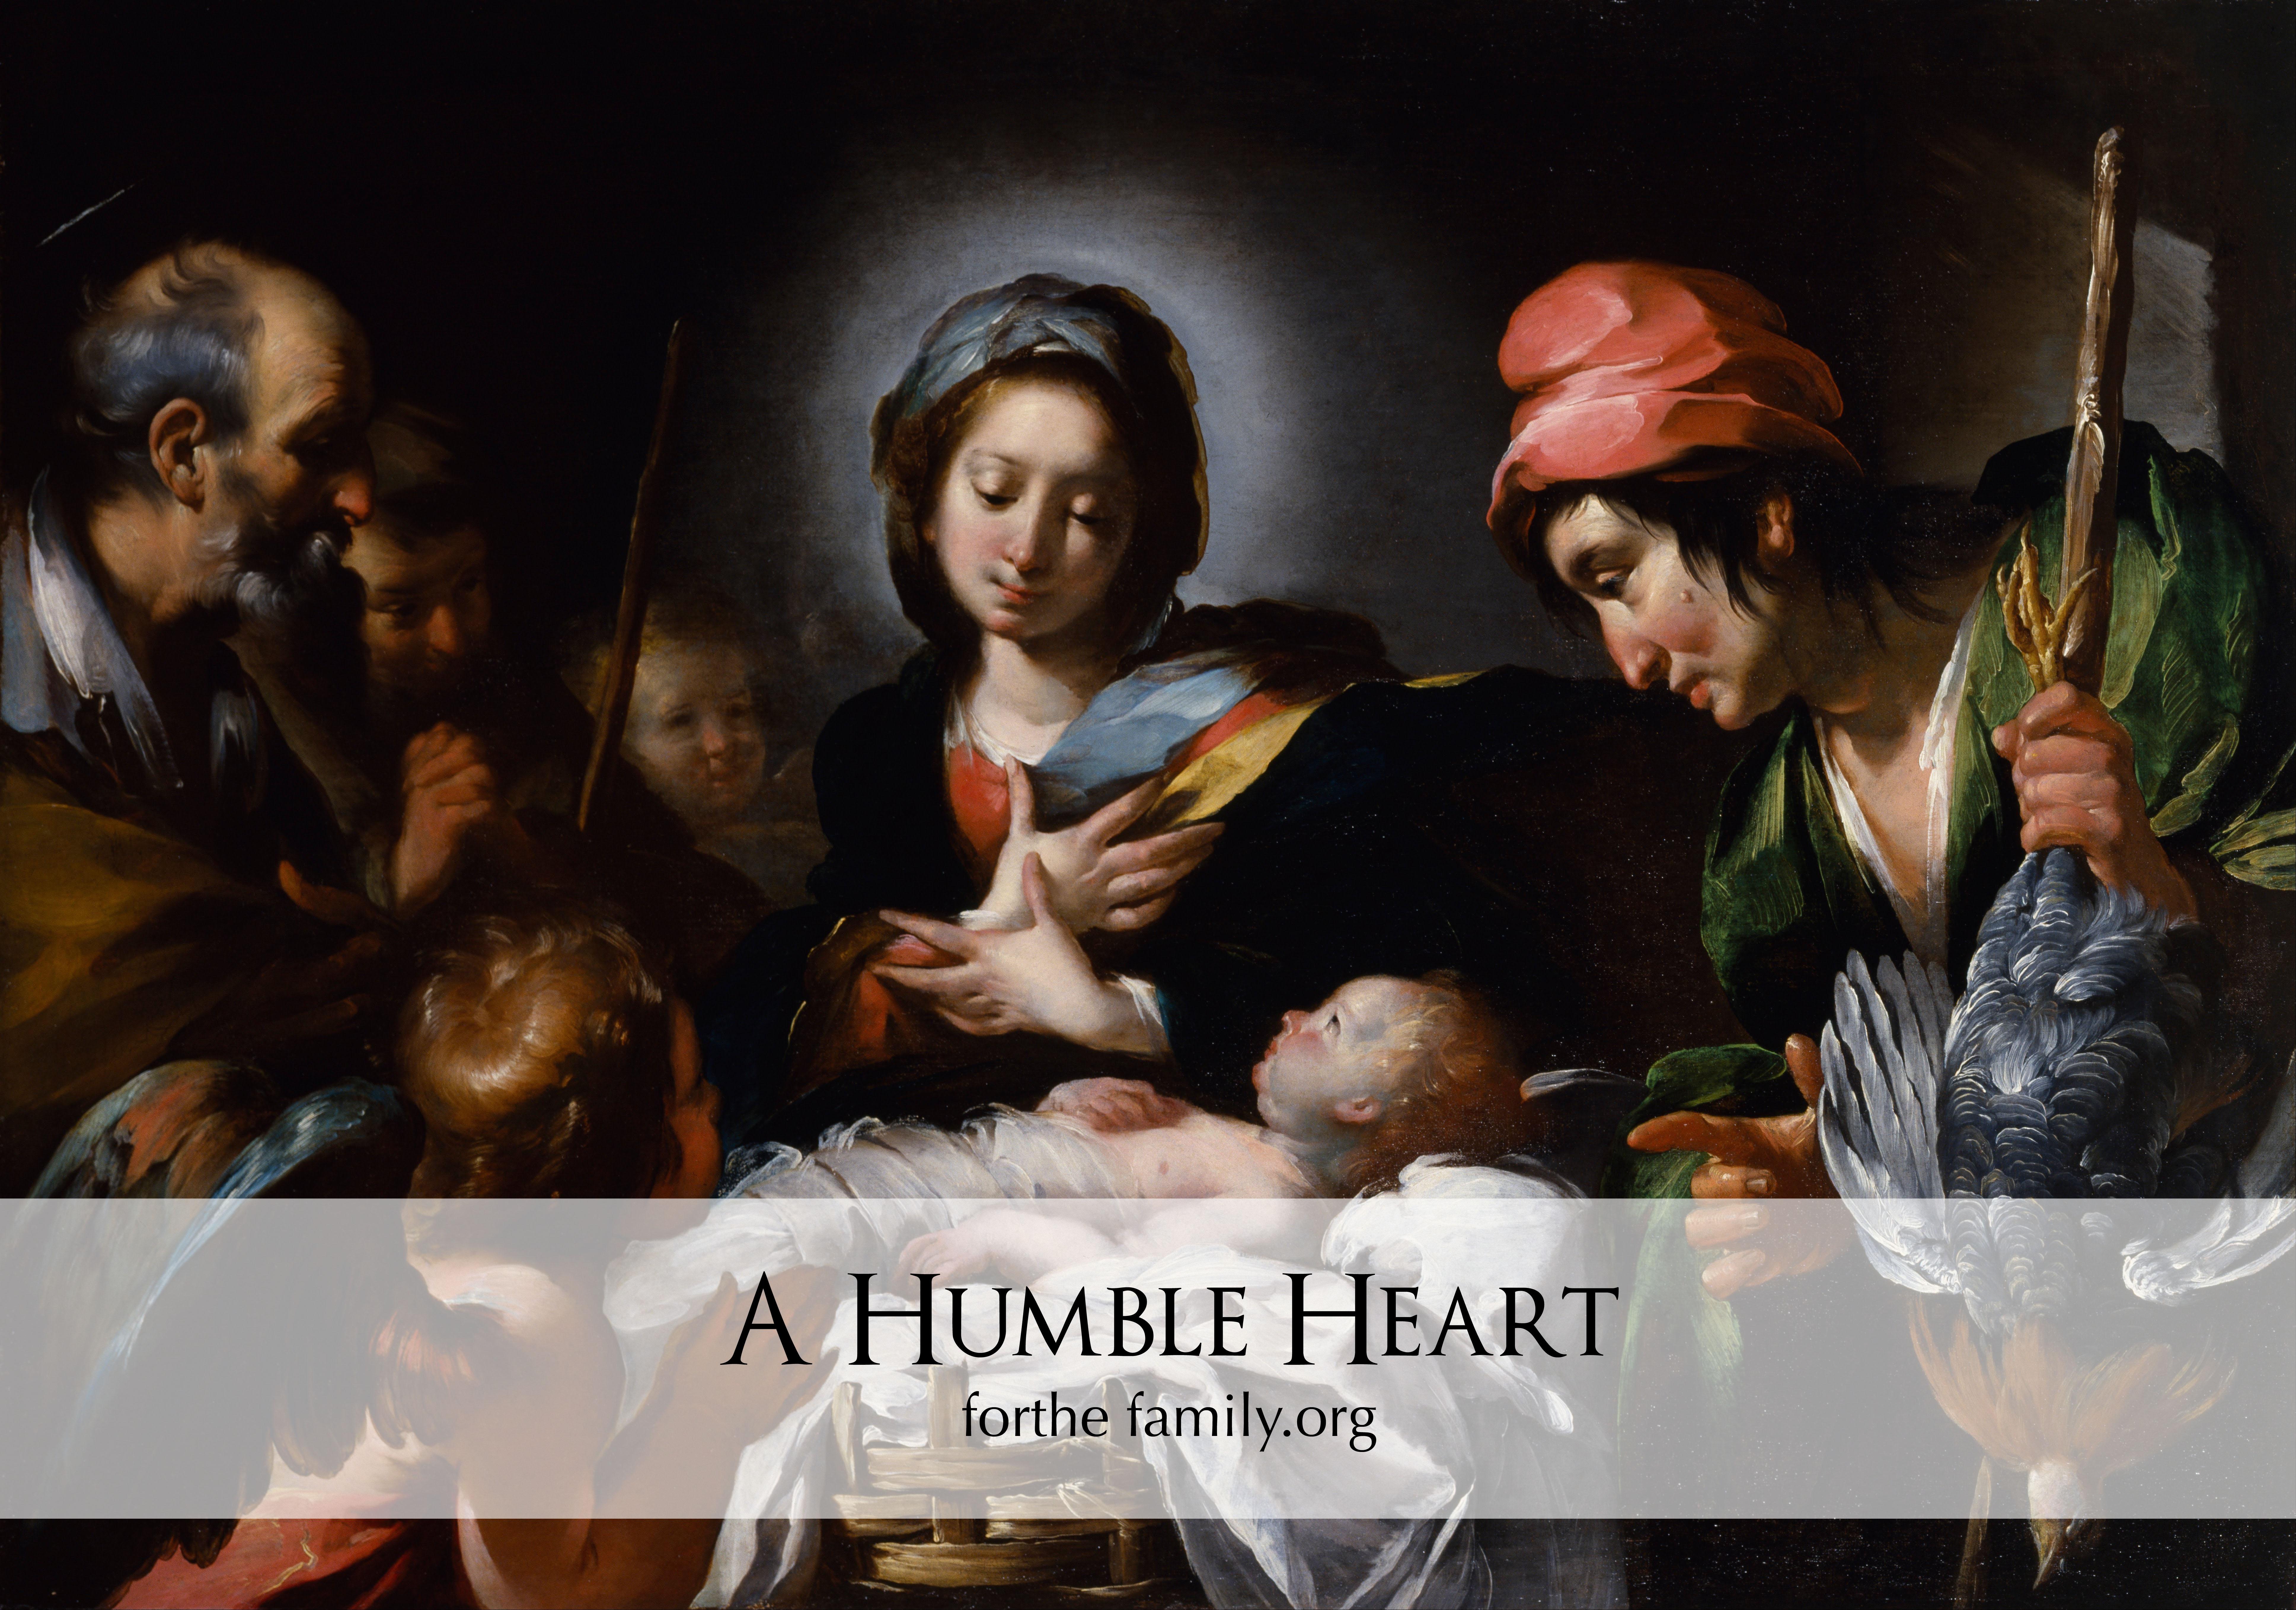 A Humble Heart